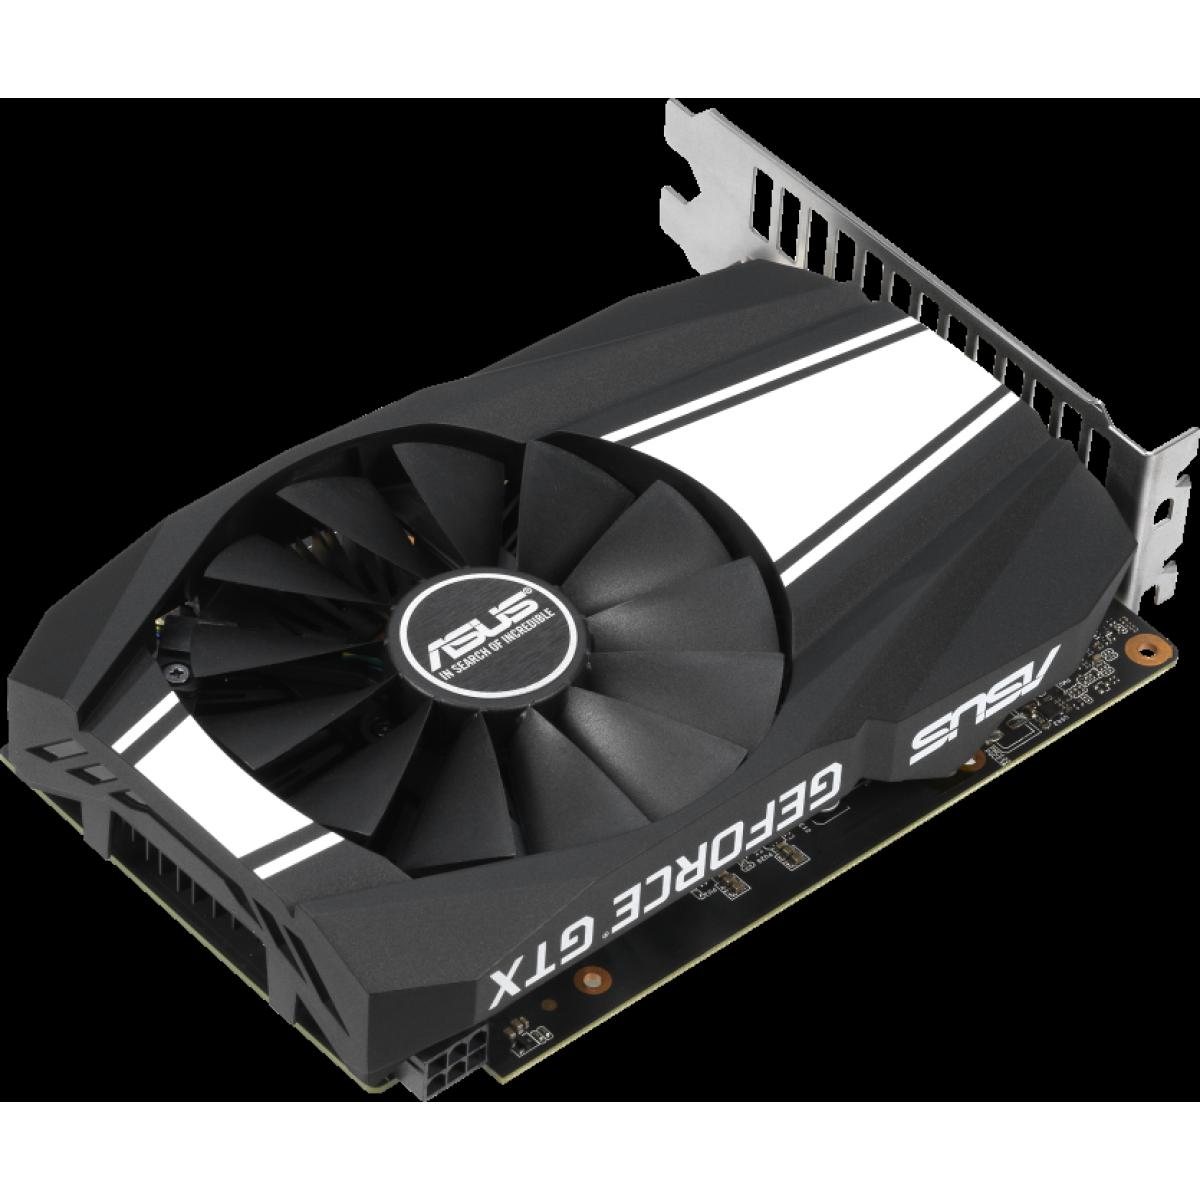 Placa de Vídeo Asus Phoenix GeForce GTX 1650 Super OC, 4GB GDDR6, 128Bit, PH-GTX1650S-O4G - Open Box